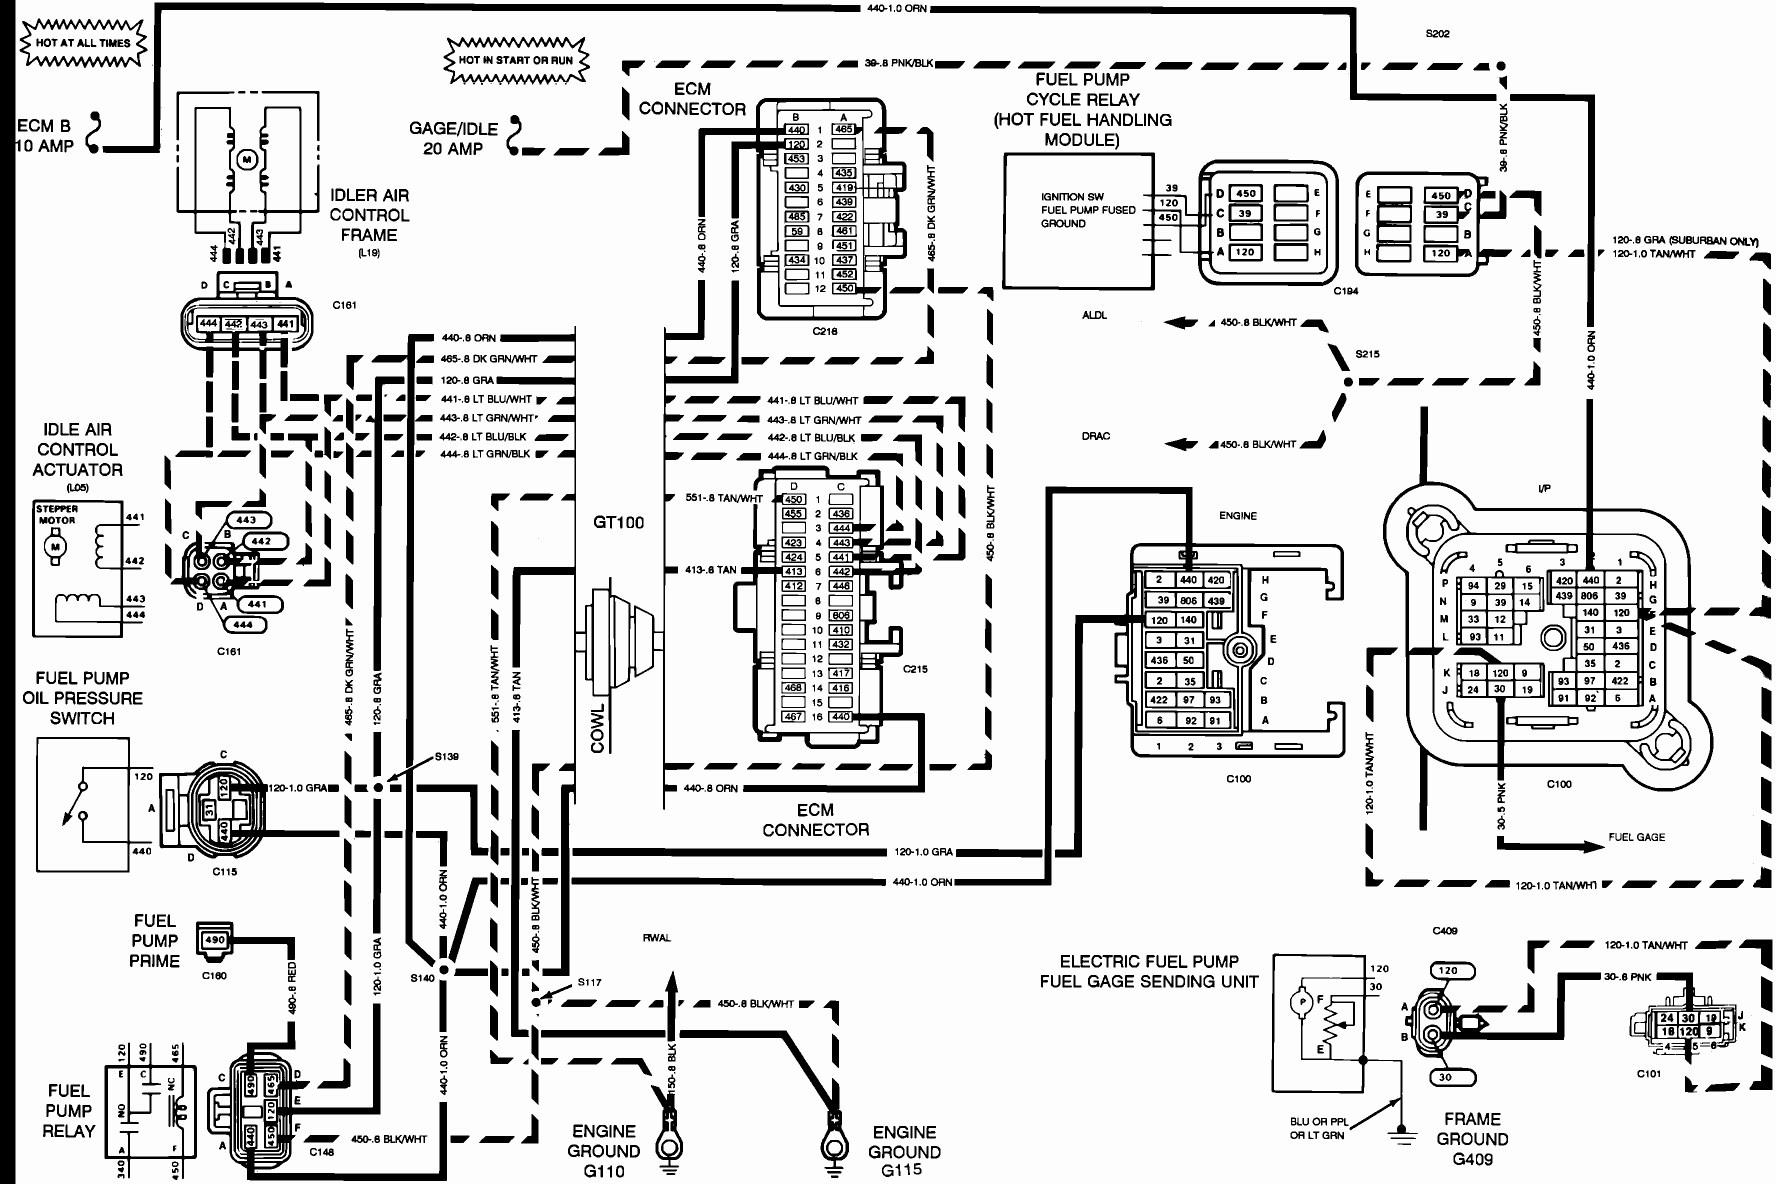 Safari Motorhome Wiring Diagram - Trusted Wiring Diagram Online - Campervan Wiring Diagram